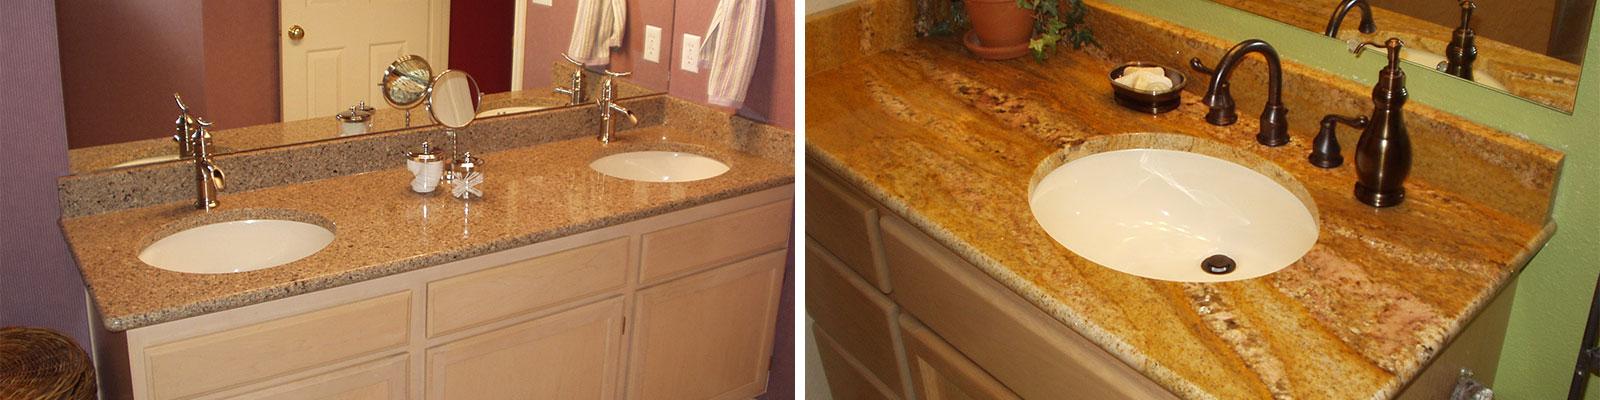 Bathroom remodeling remodel granite quartz and corian in for Bath remodel gig harbor